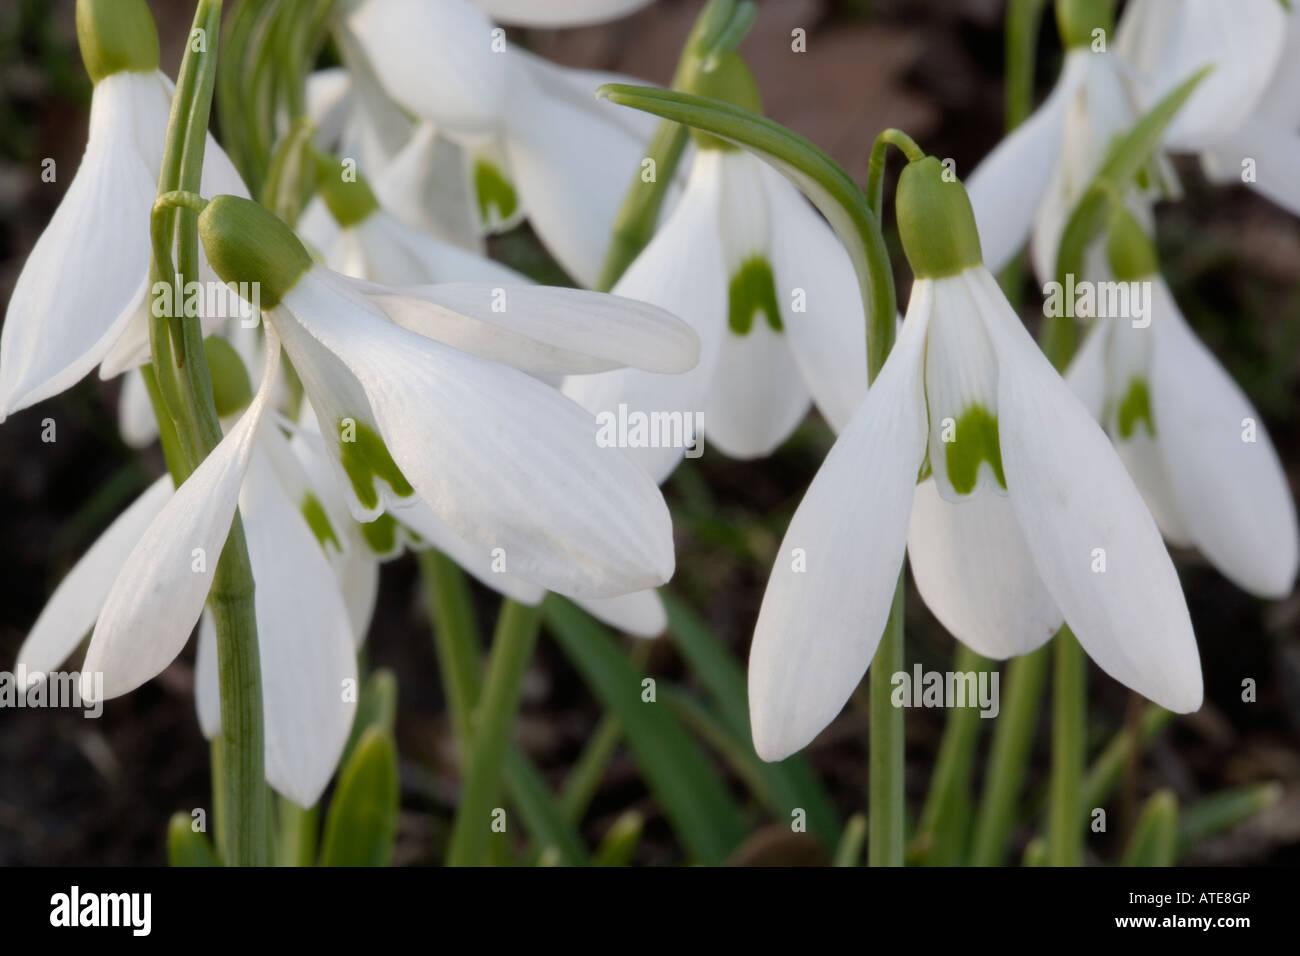 Snowdrop Flowers In Winter February England Uk Stock Photo 16291269